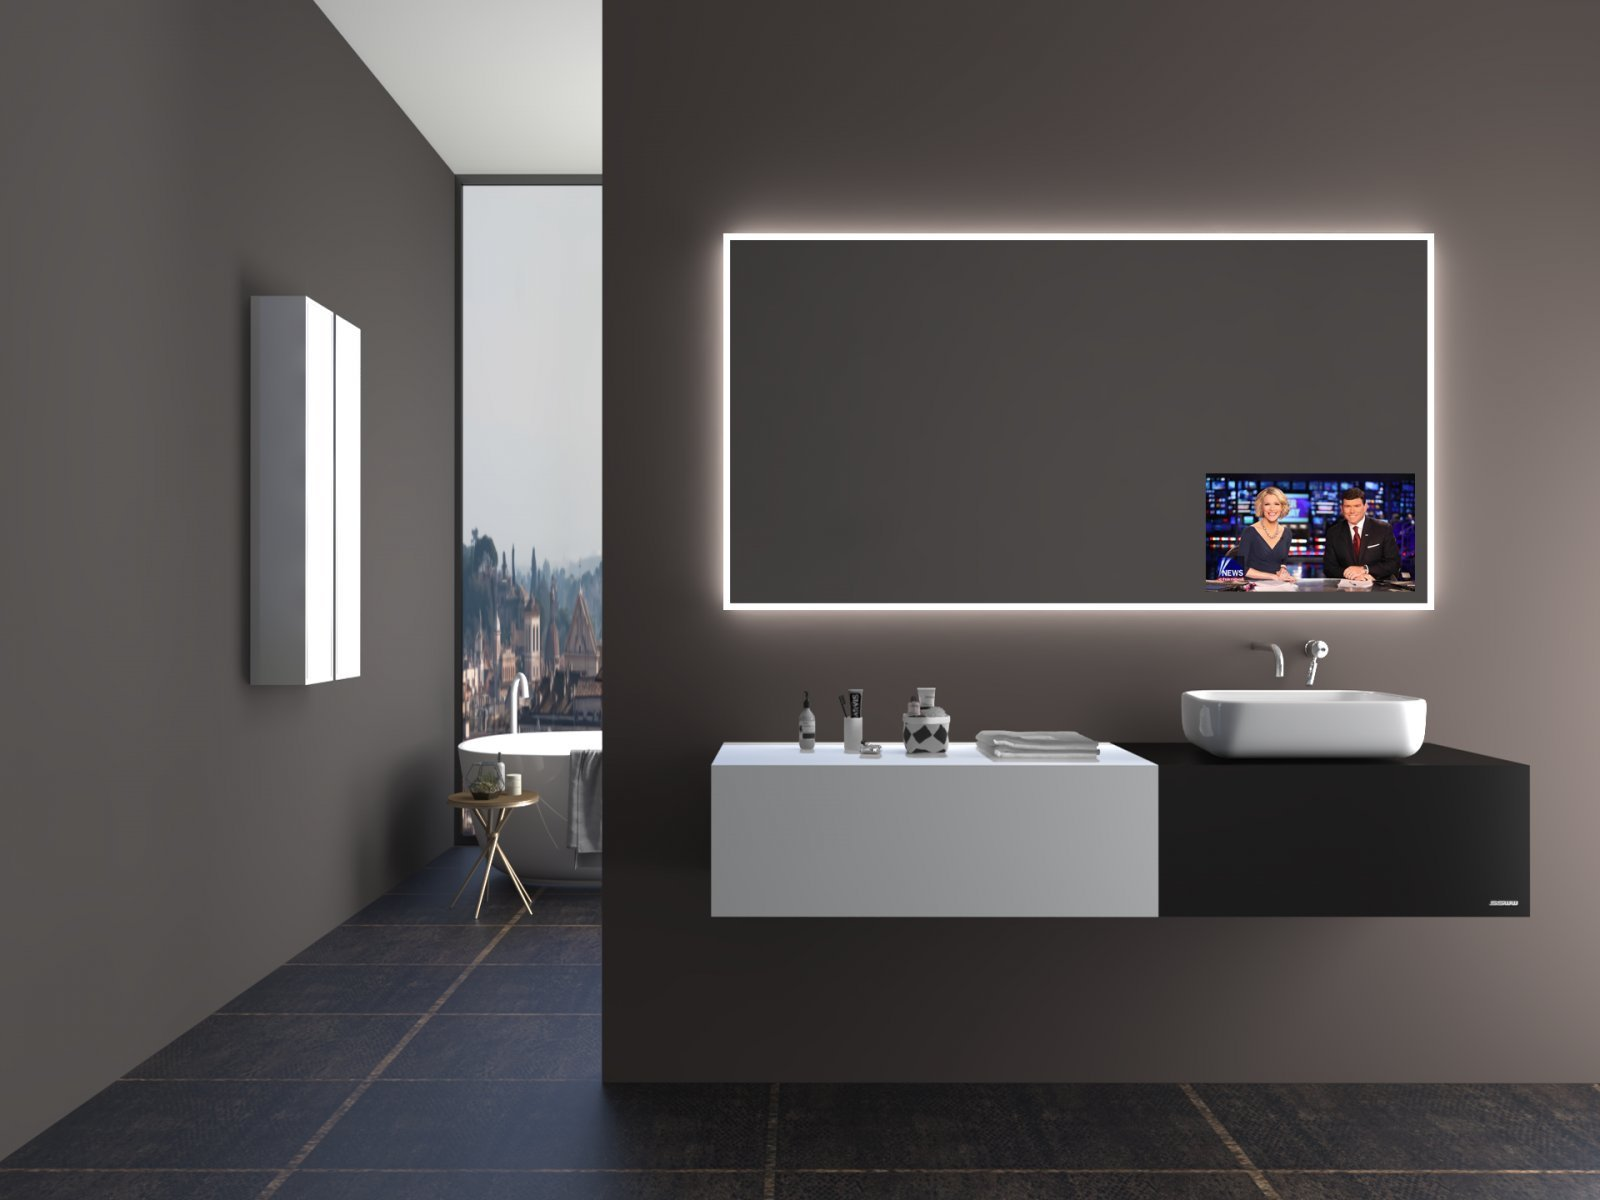 Unbekannt TV Espejo T401 con a + + LED Iluminación – (B) 90 cm x (H) 90